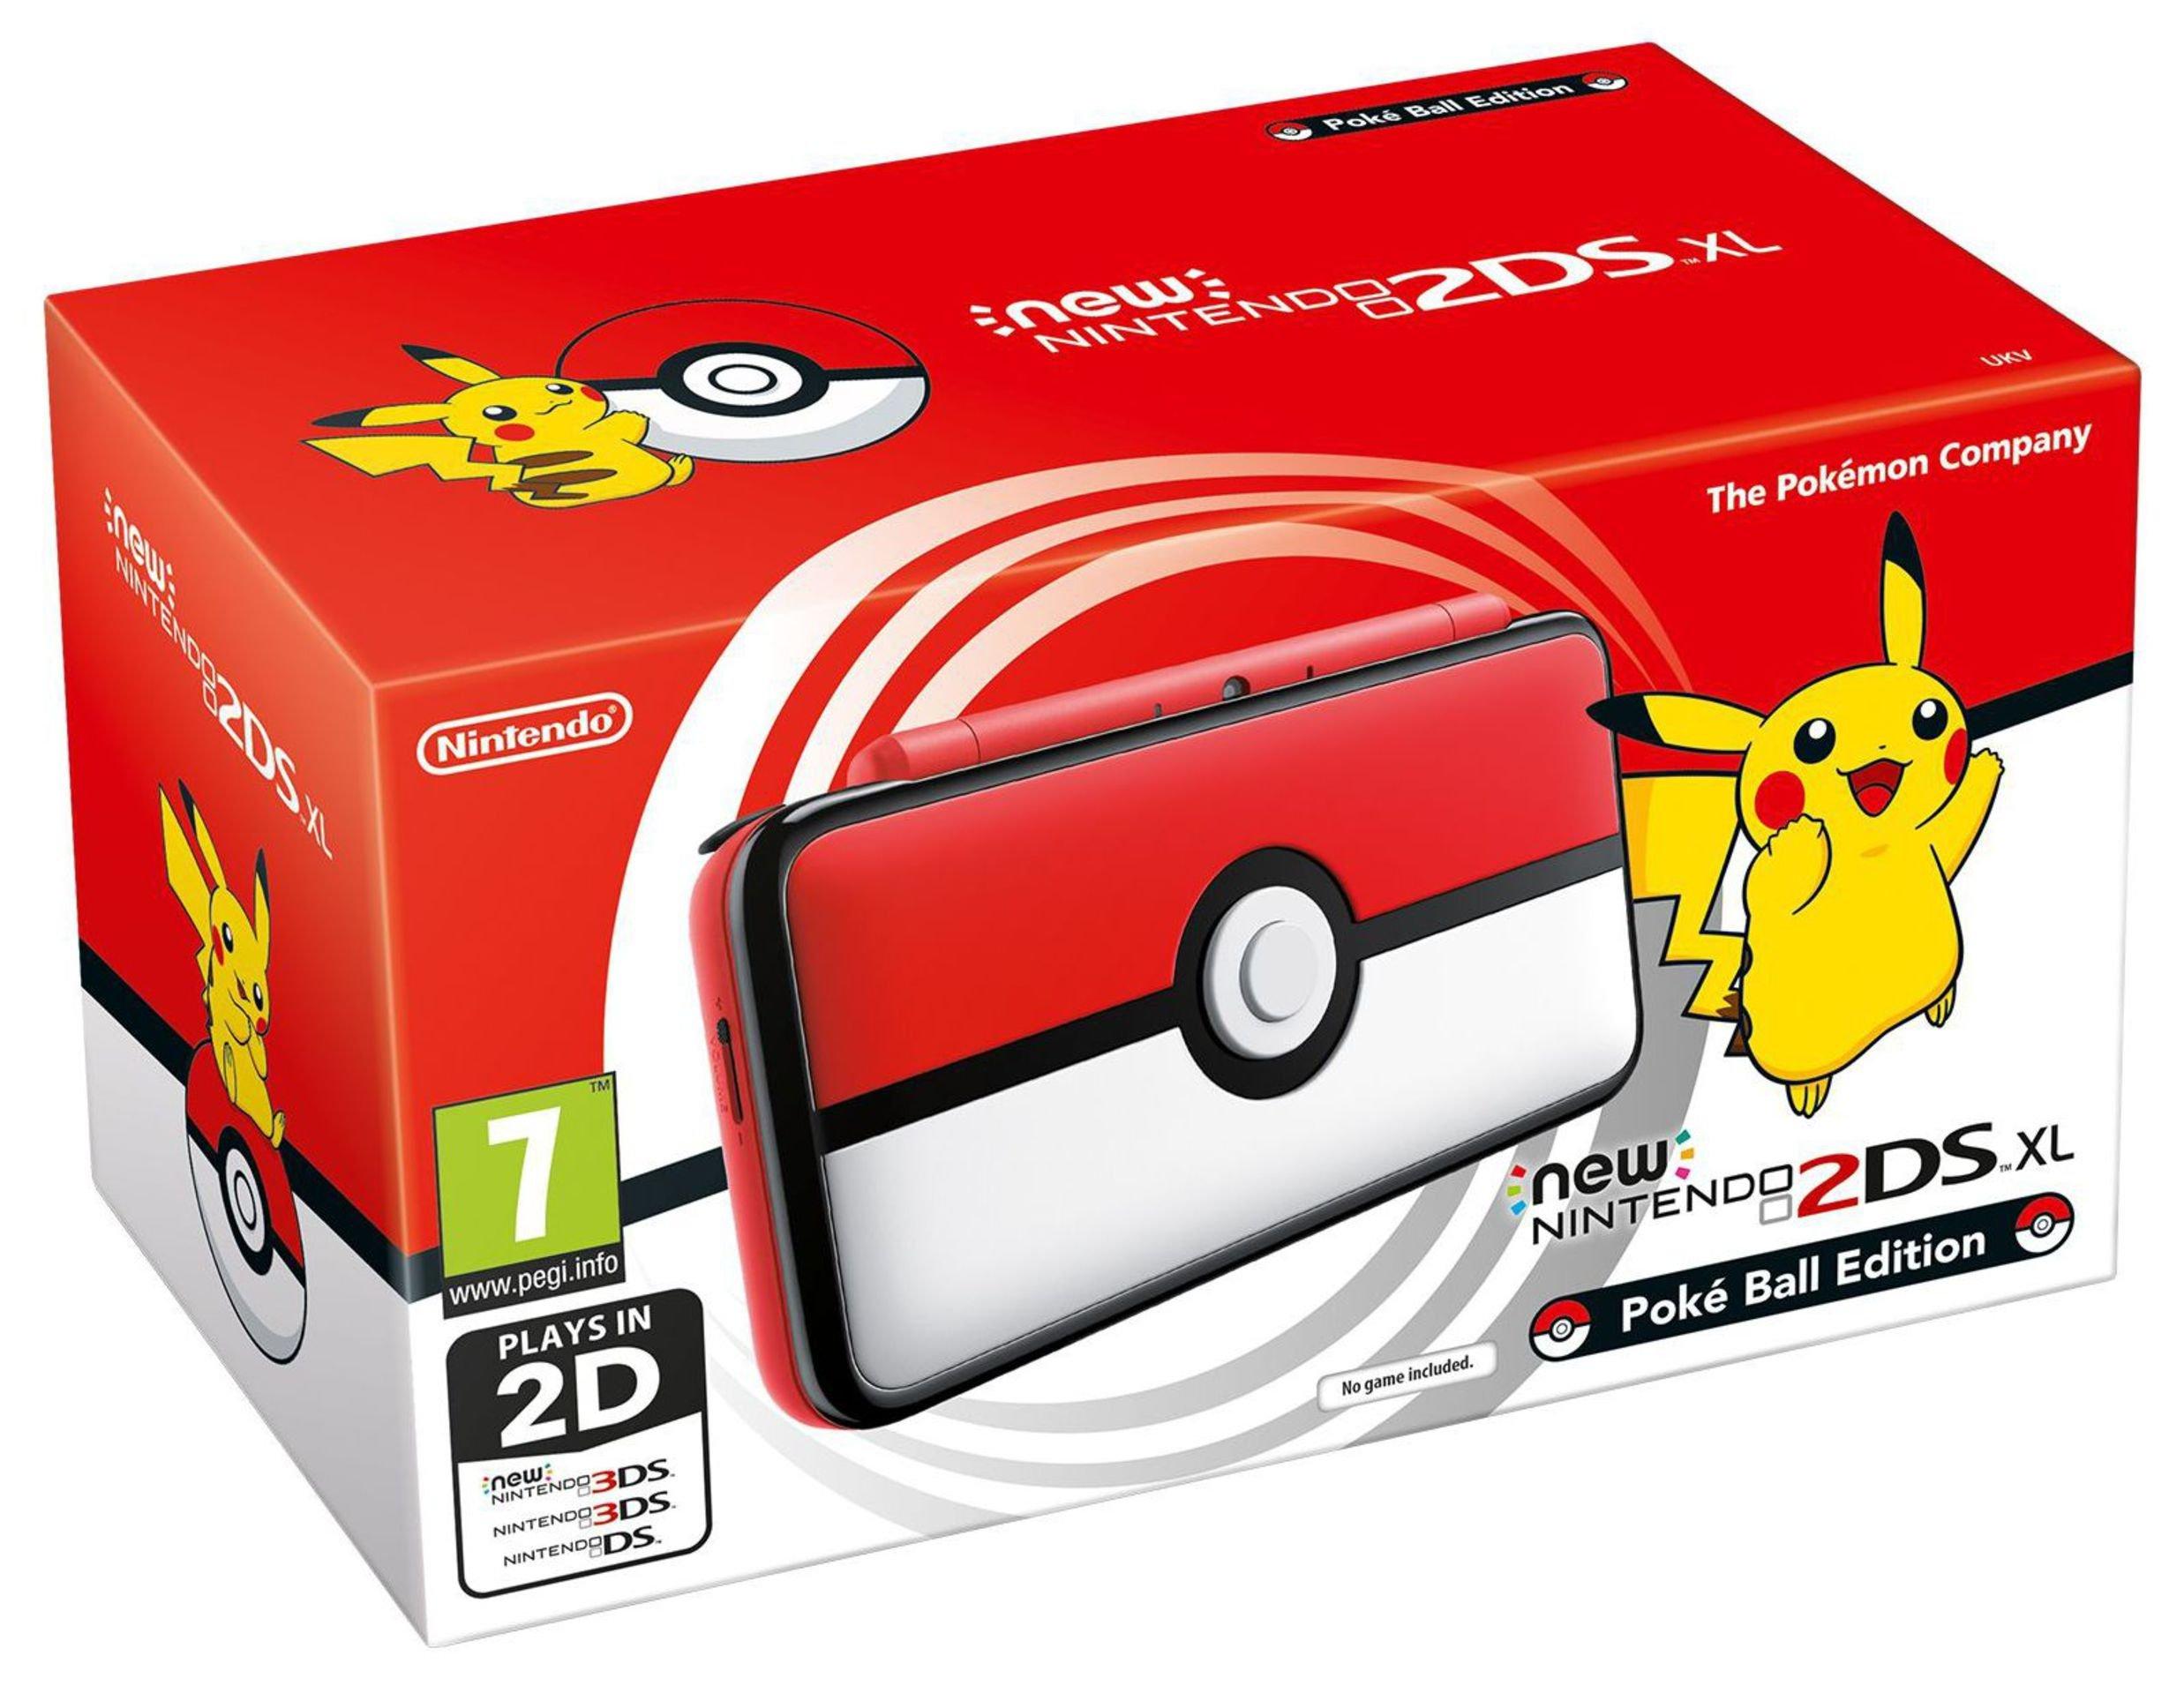 New Nintendo 2DS XL Pokeball Pokemon Edition